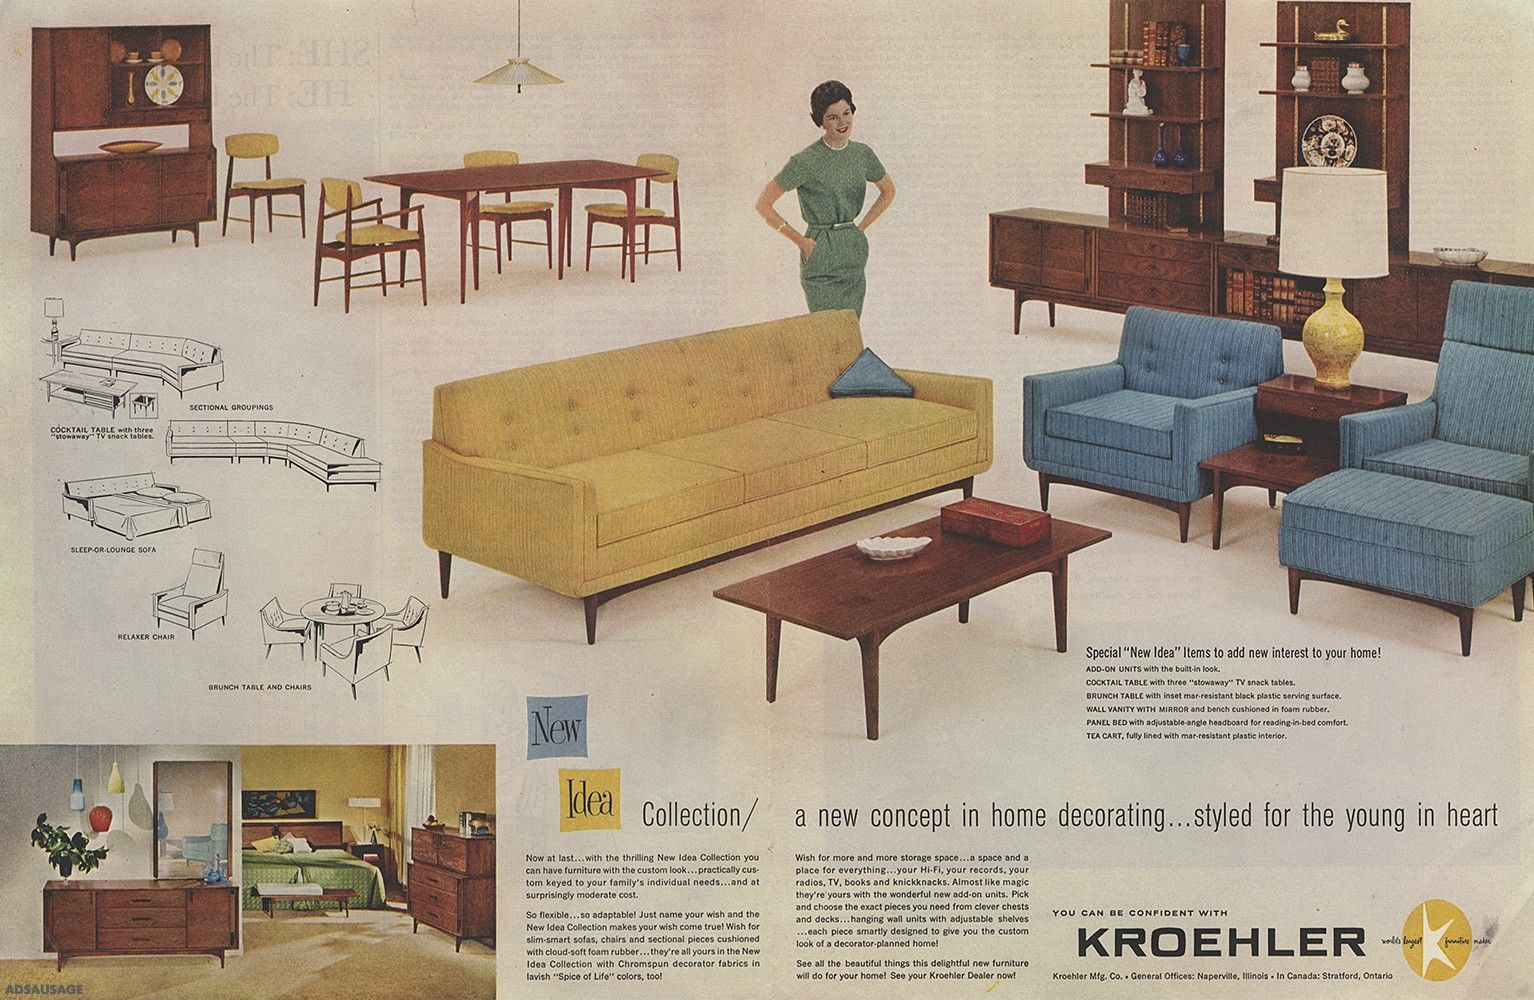 Vintage Print Ad Kroehler Furniture New Idea Collection